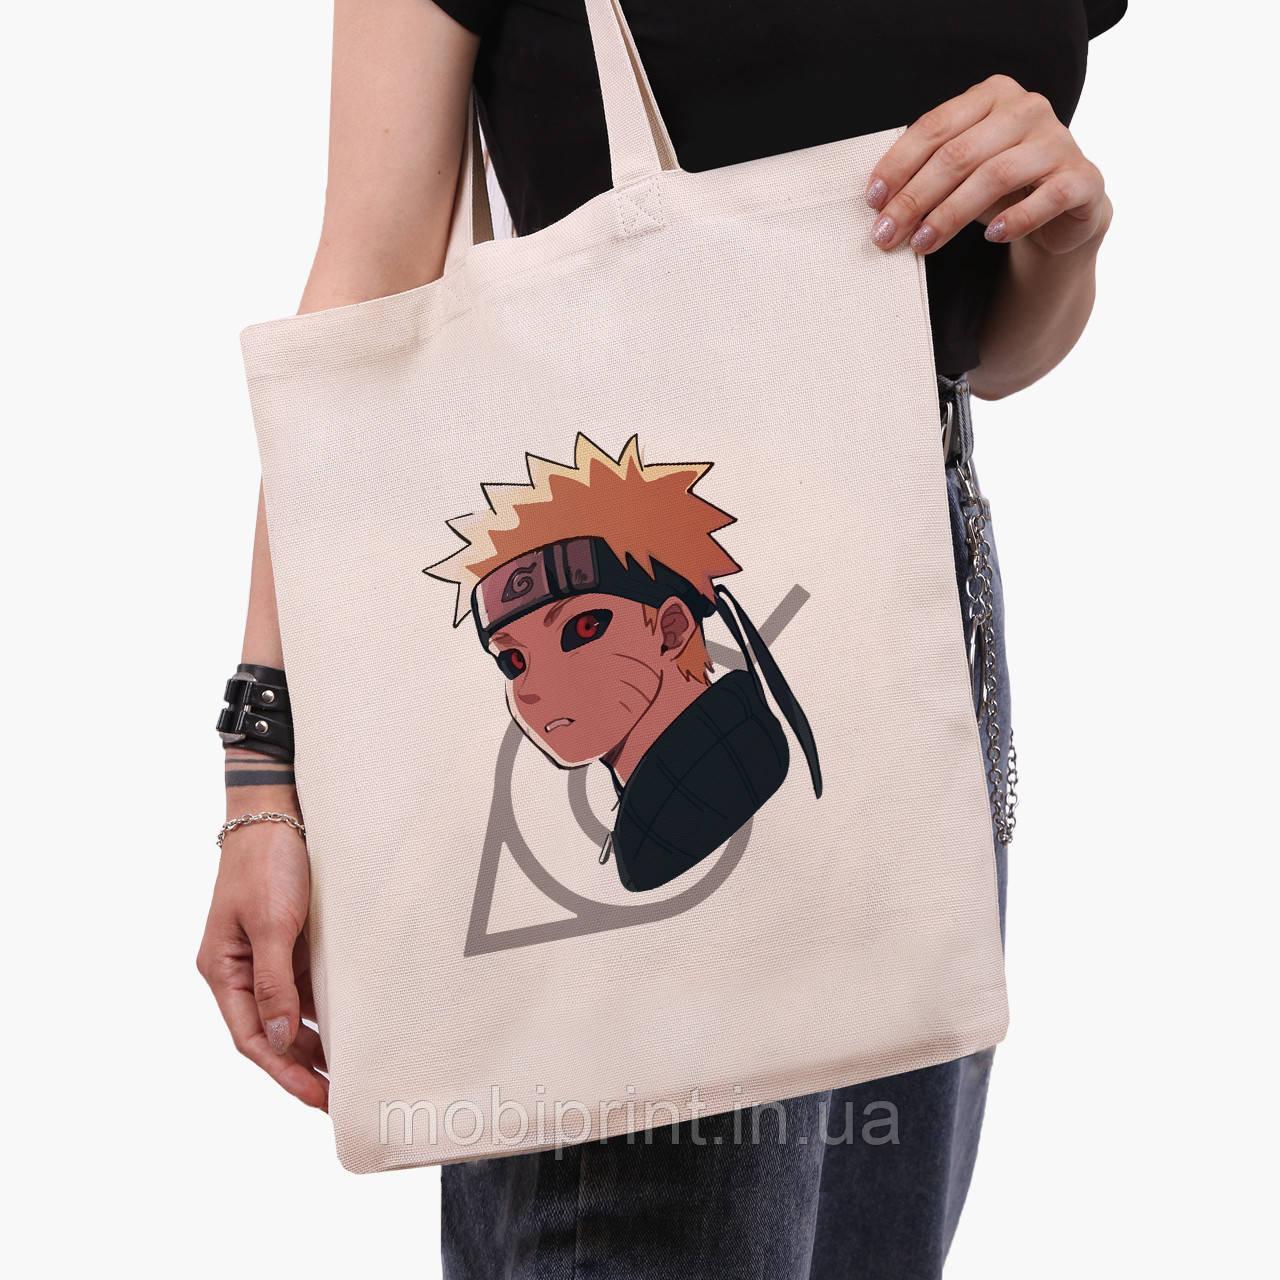 Эко сумка шоппер Наруто Узумаки (Naruto Uzumaki) (9227-2822)  41*35 см